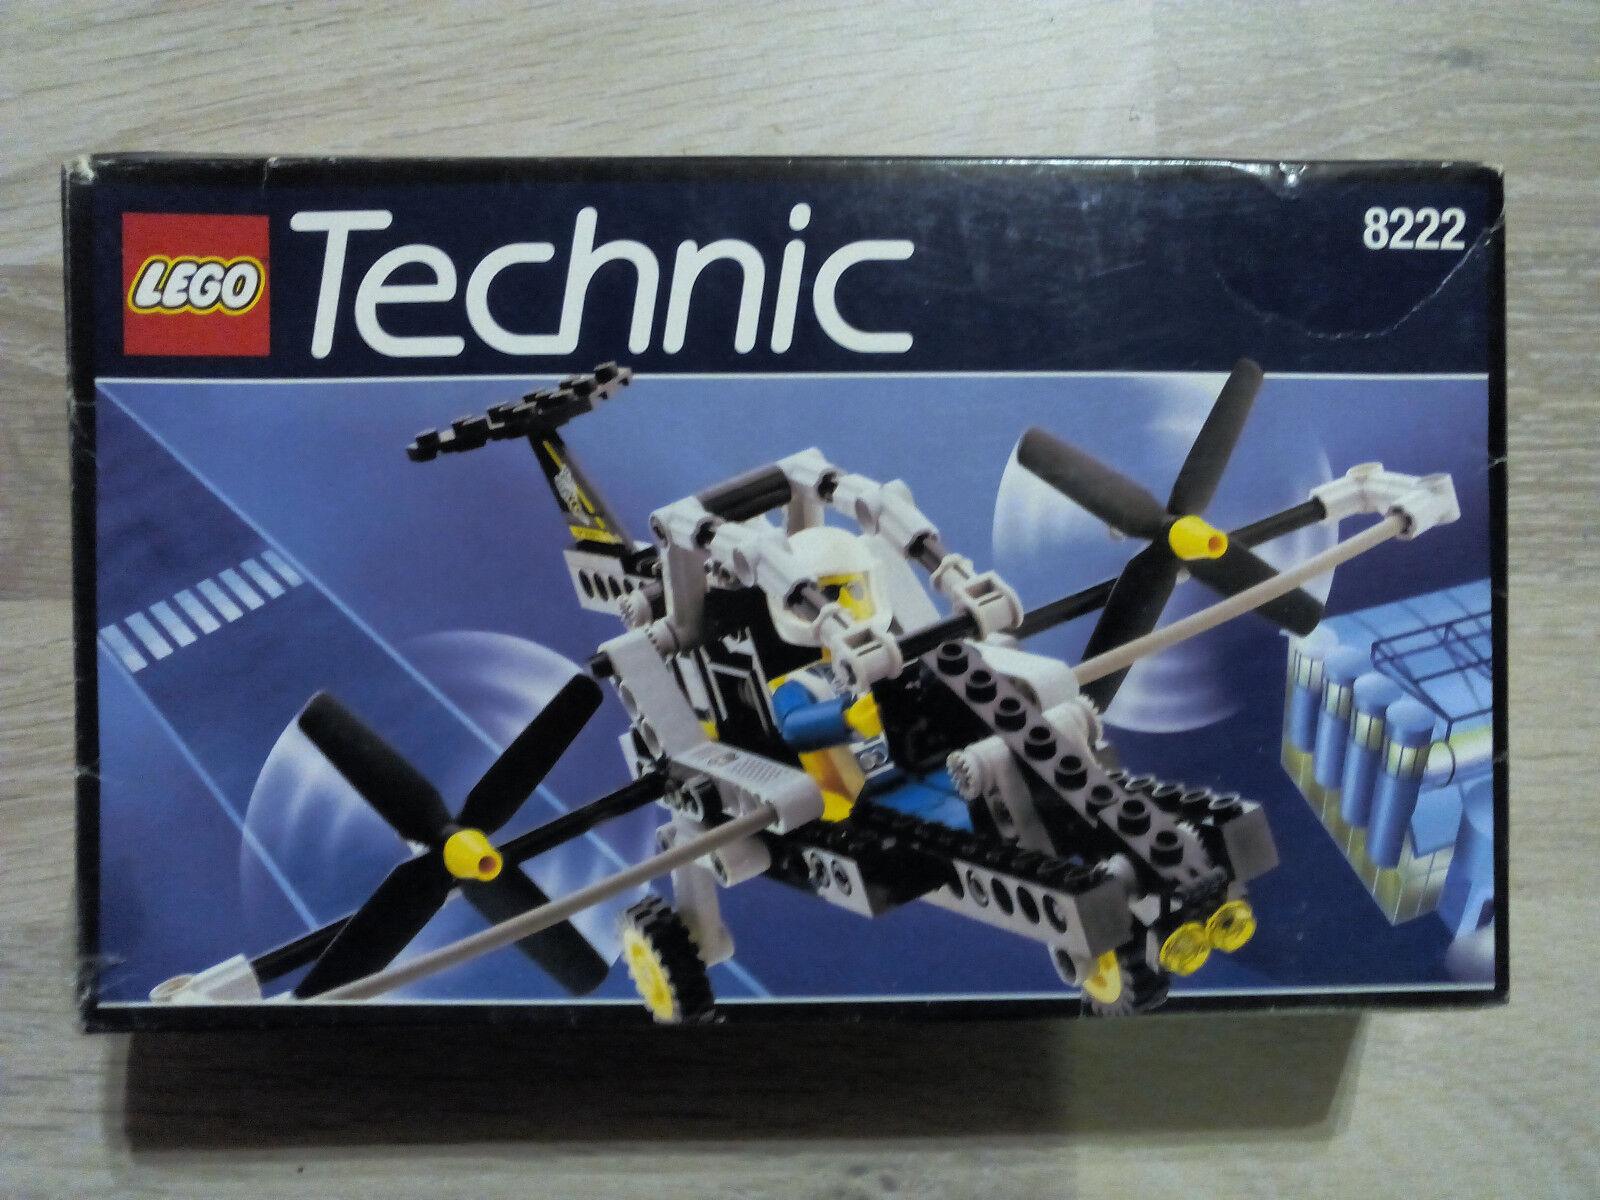 Lego Technic Technik 8222 VTOL Airplane   NEU & OVP - RARITÄT